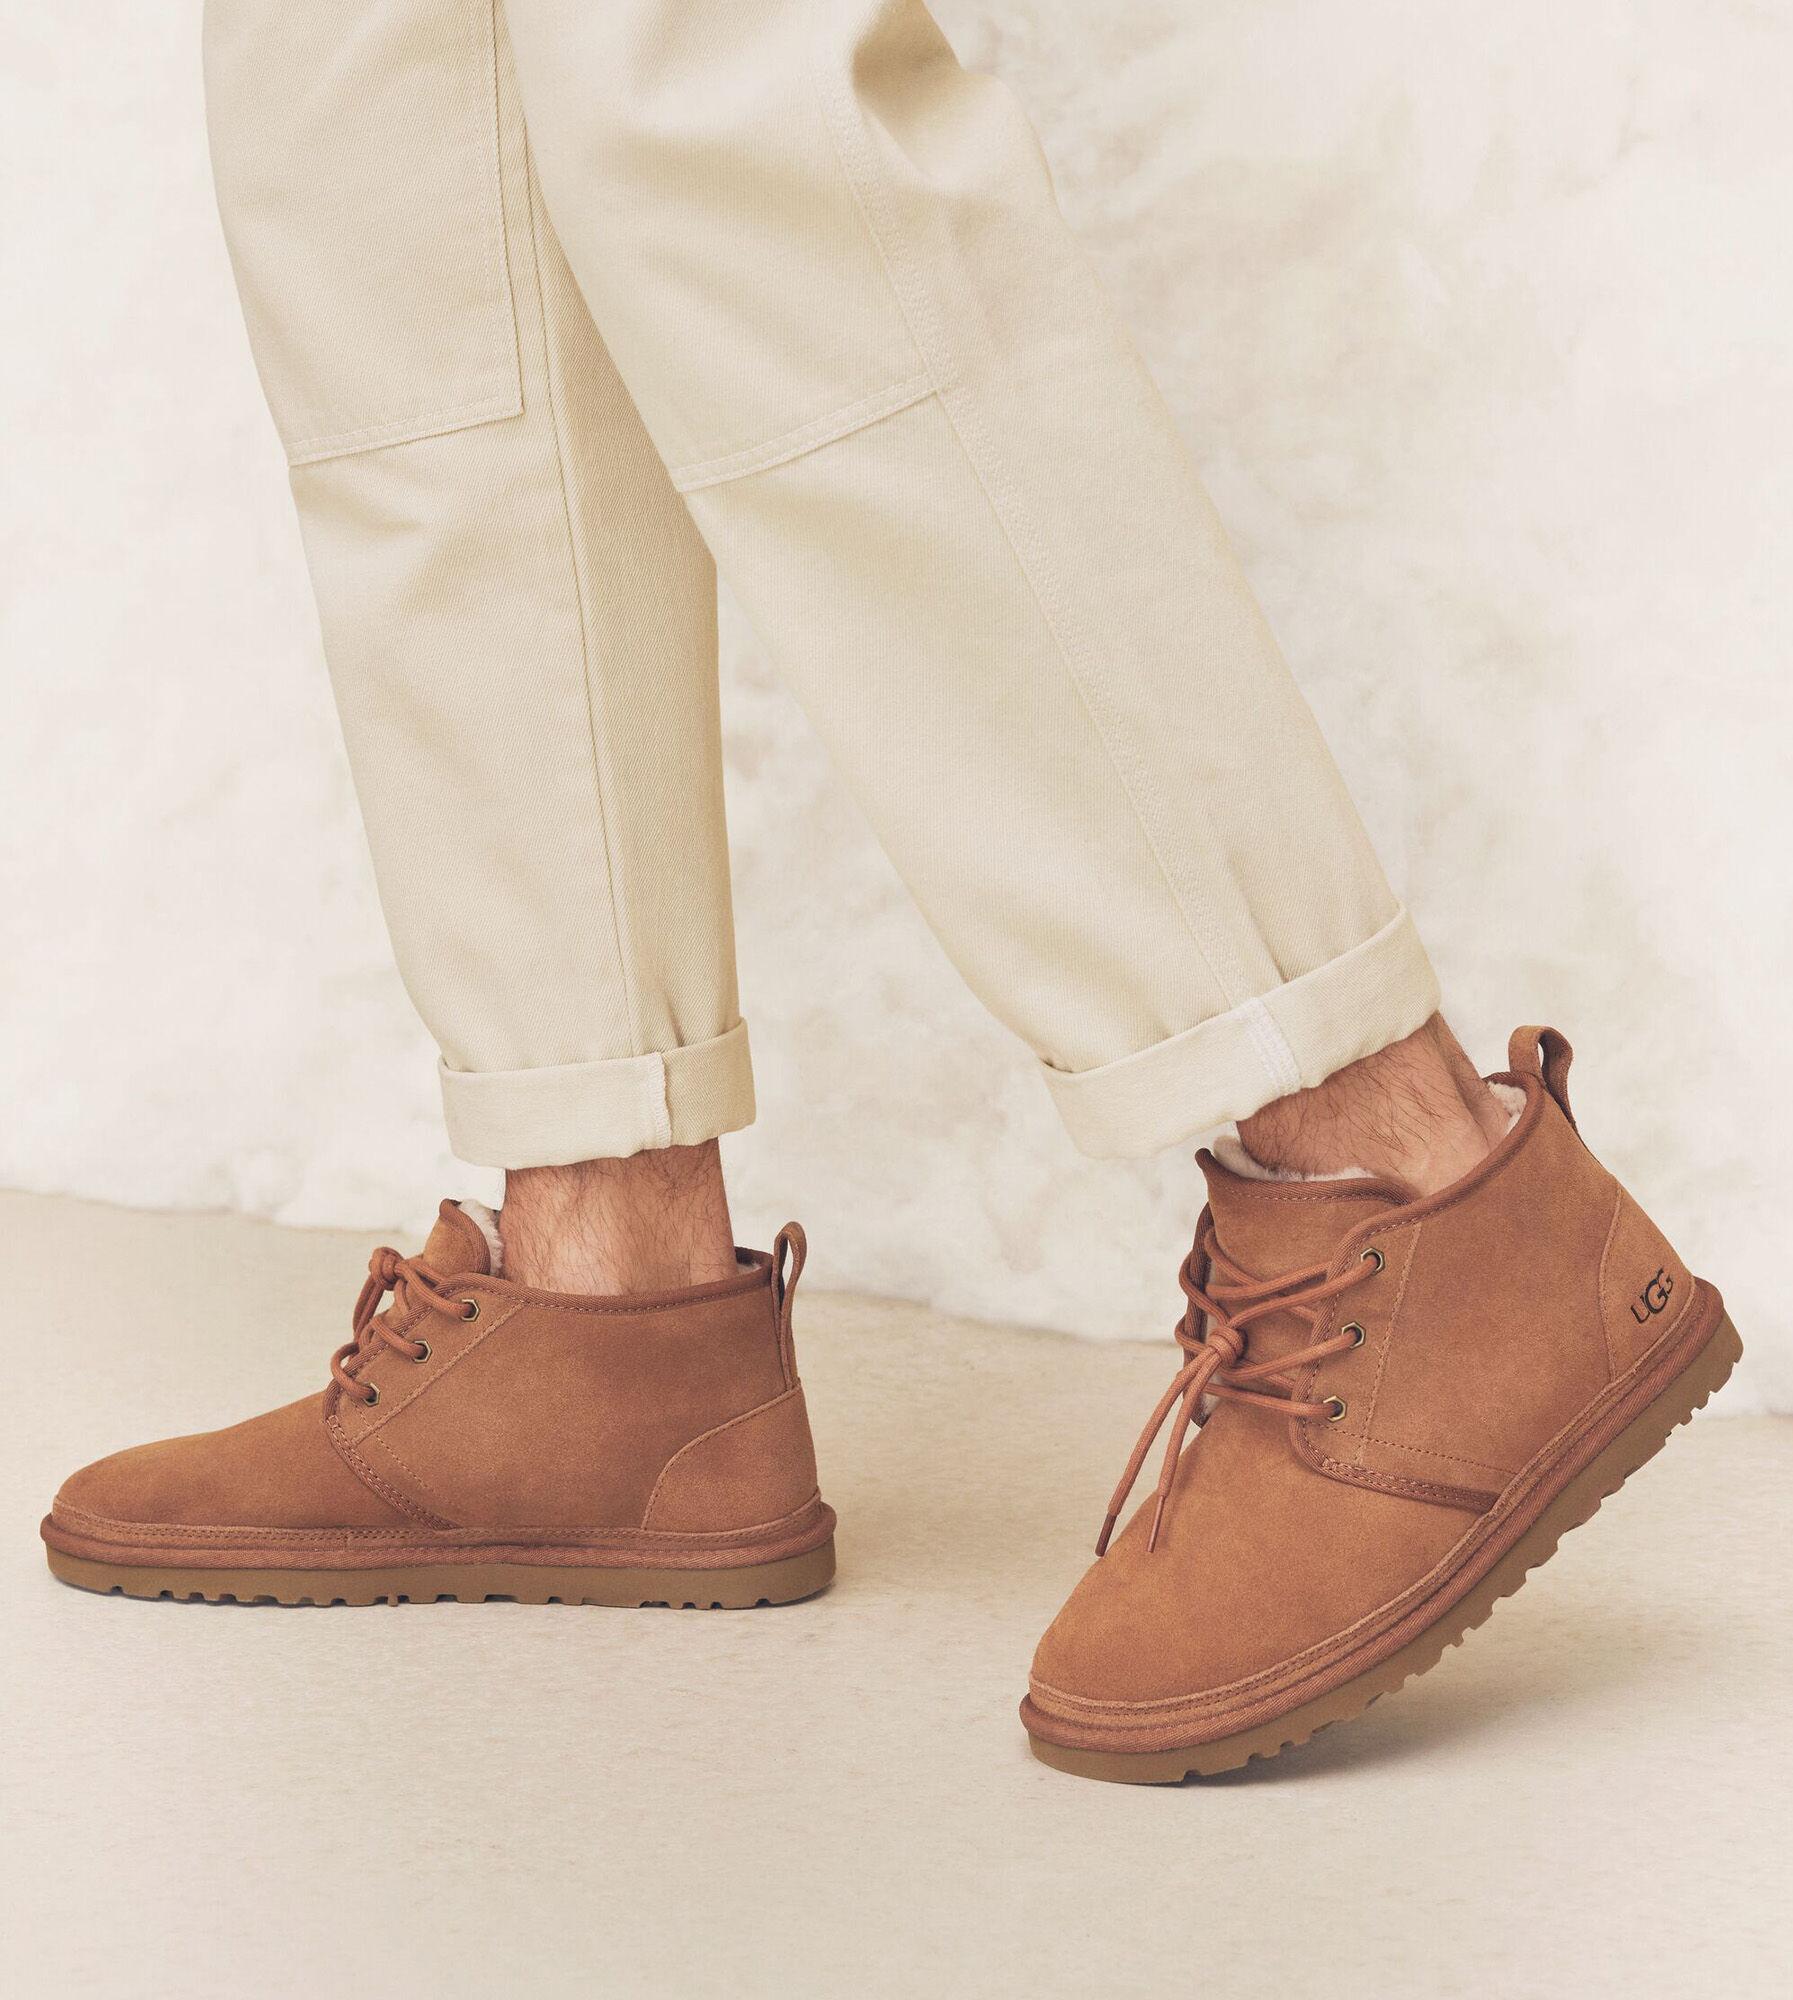 mens ugg slippers sale